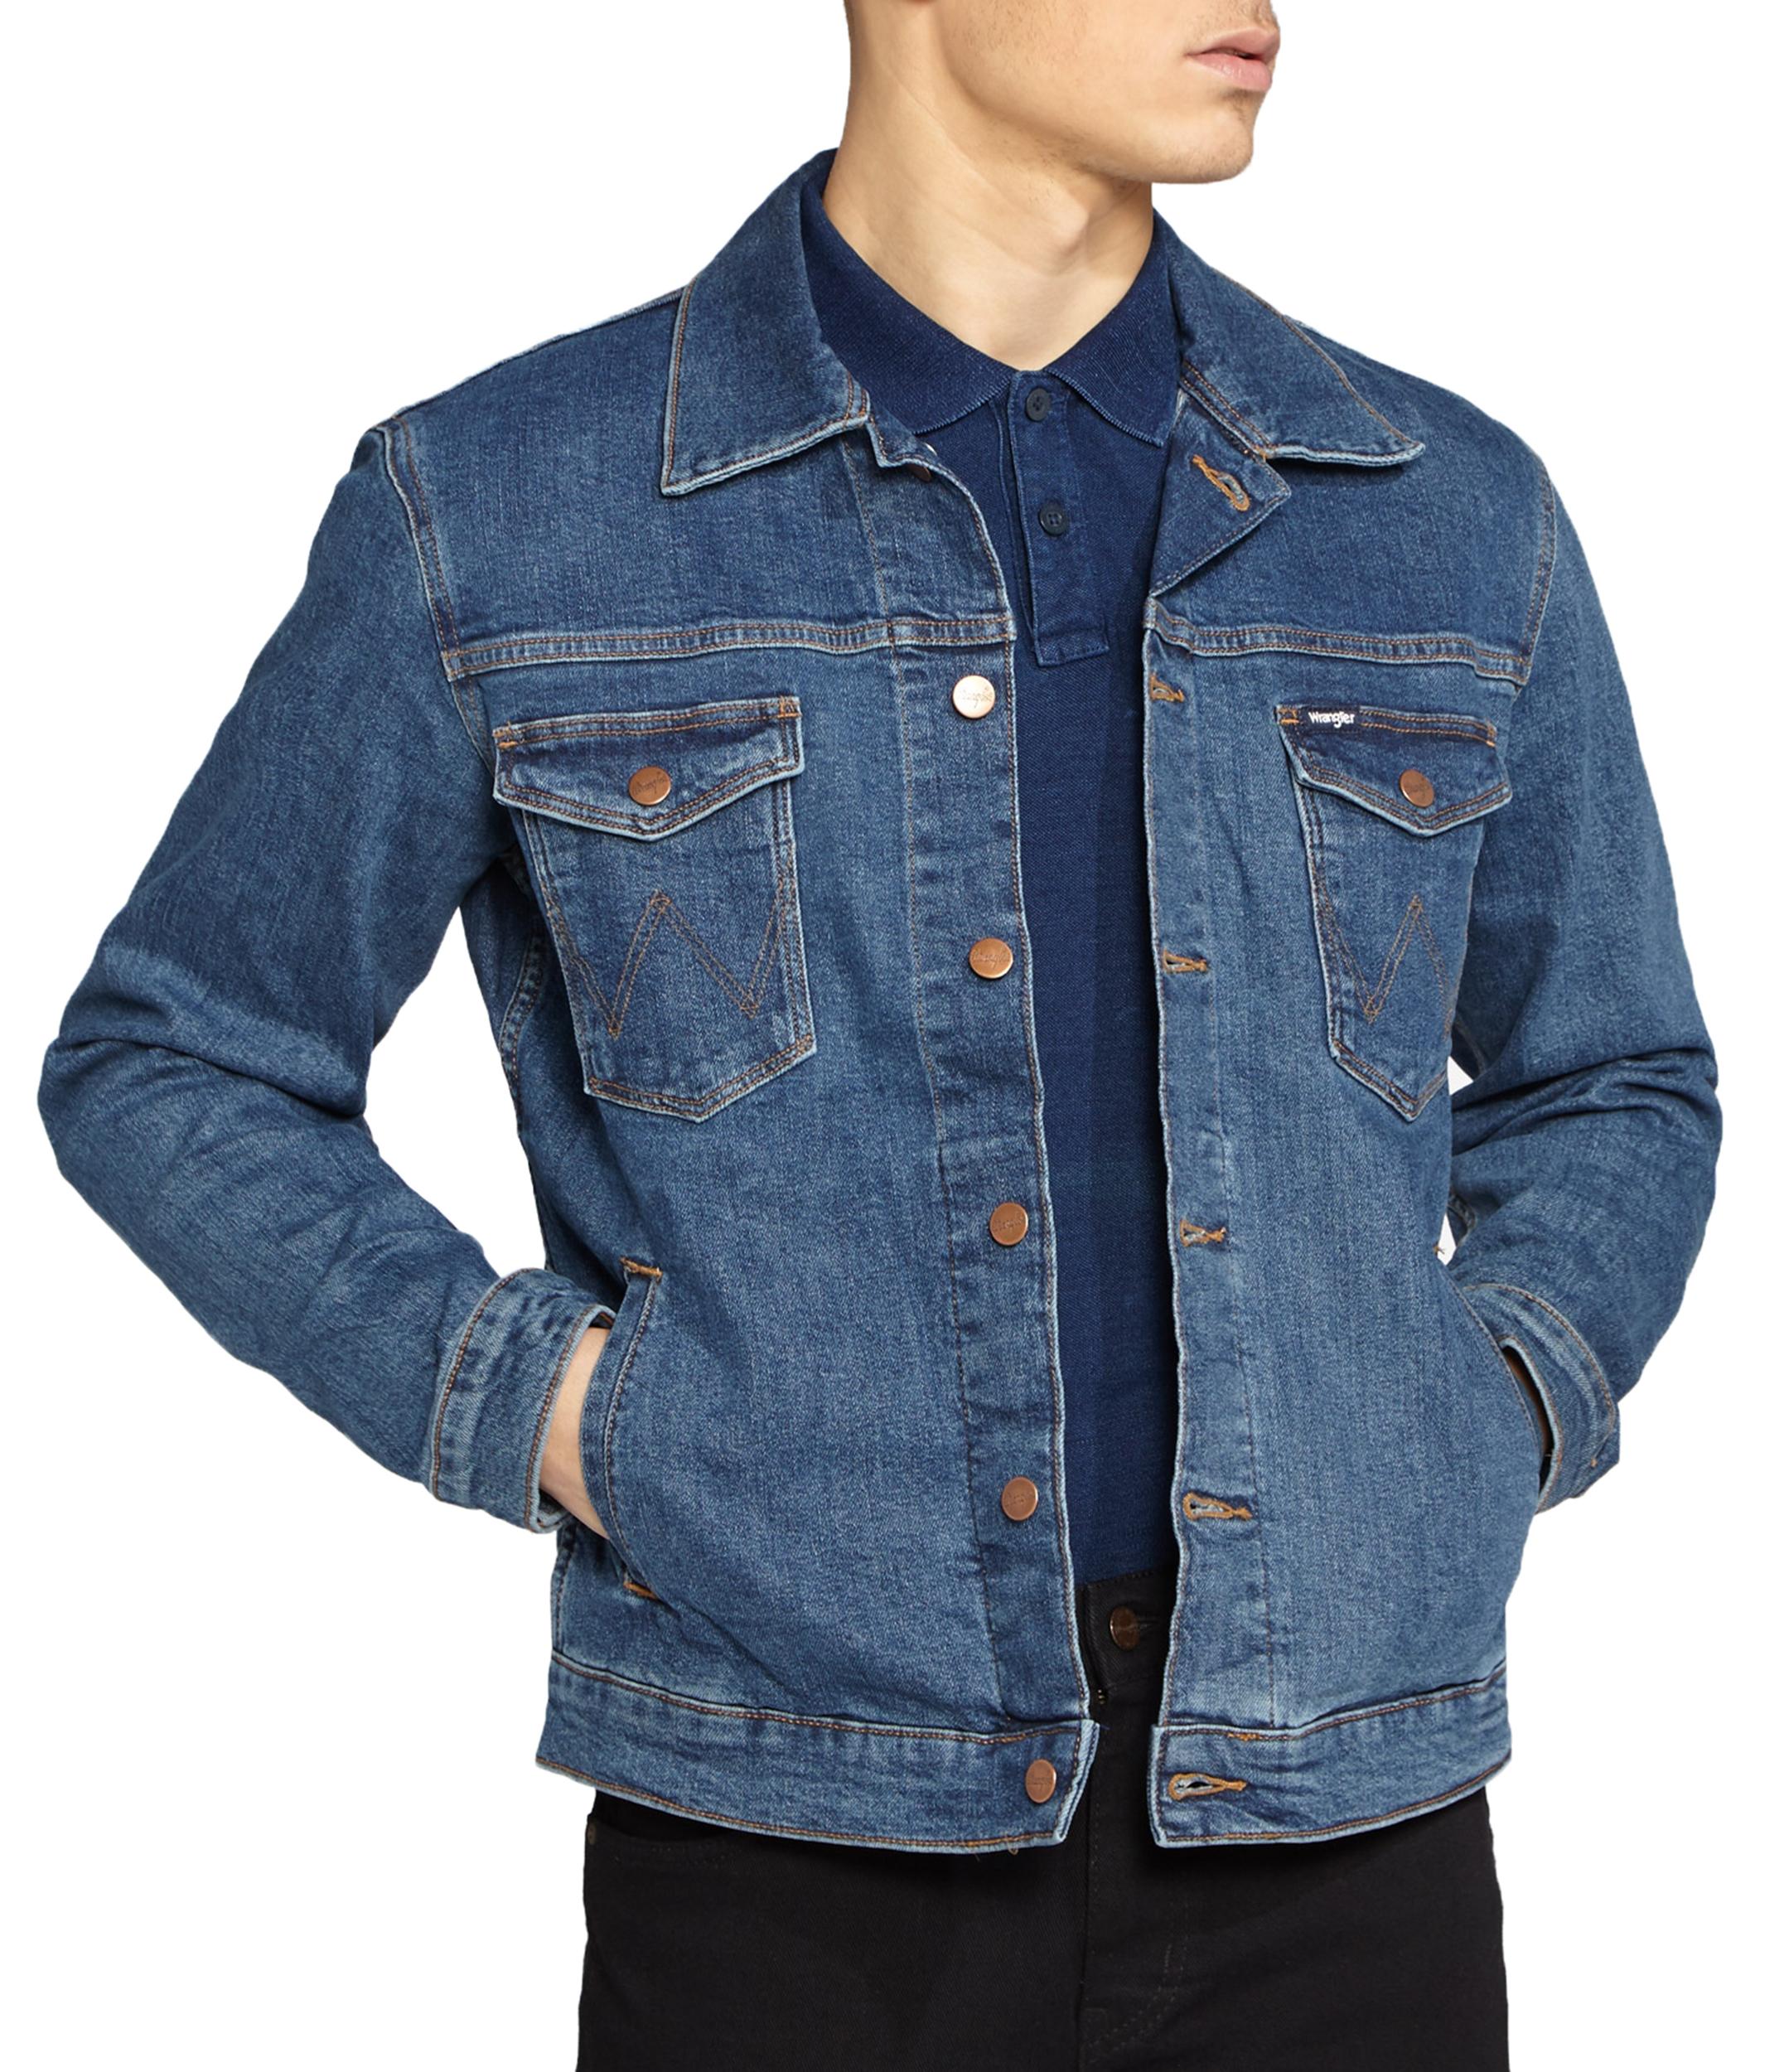 THE TRUCKER JACKET Giacca in denim con bottoni Jeans slavati